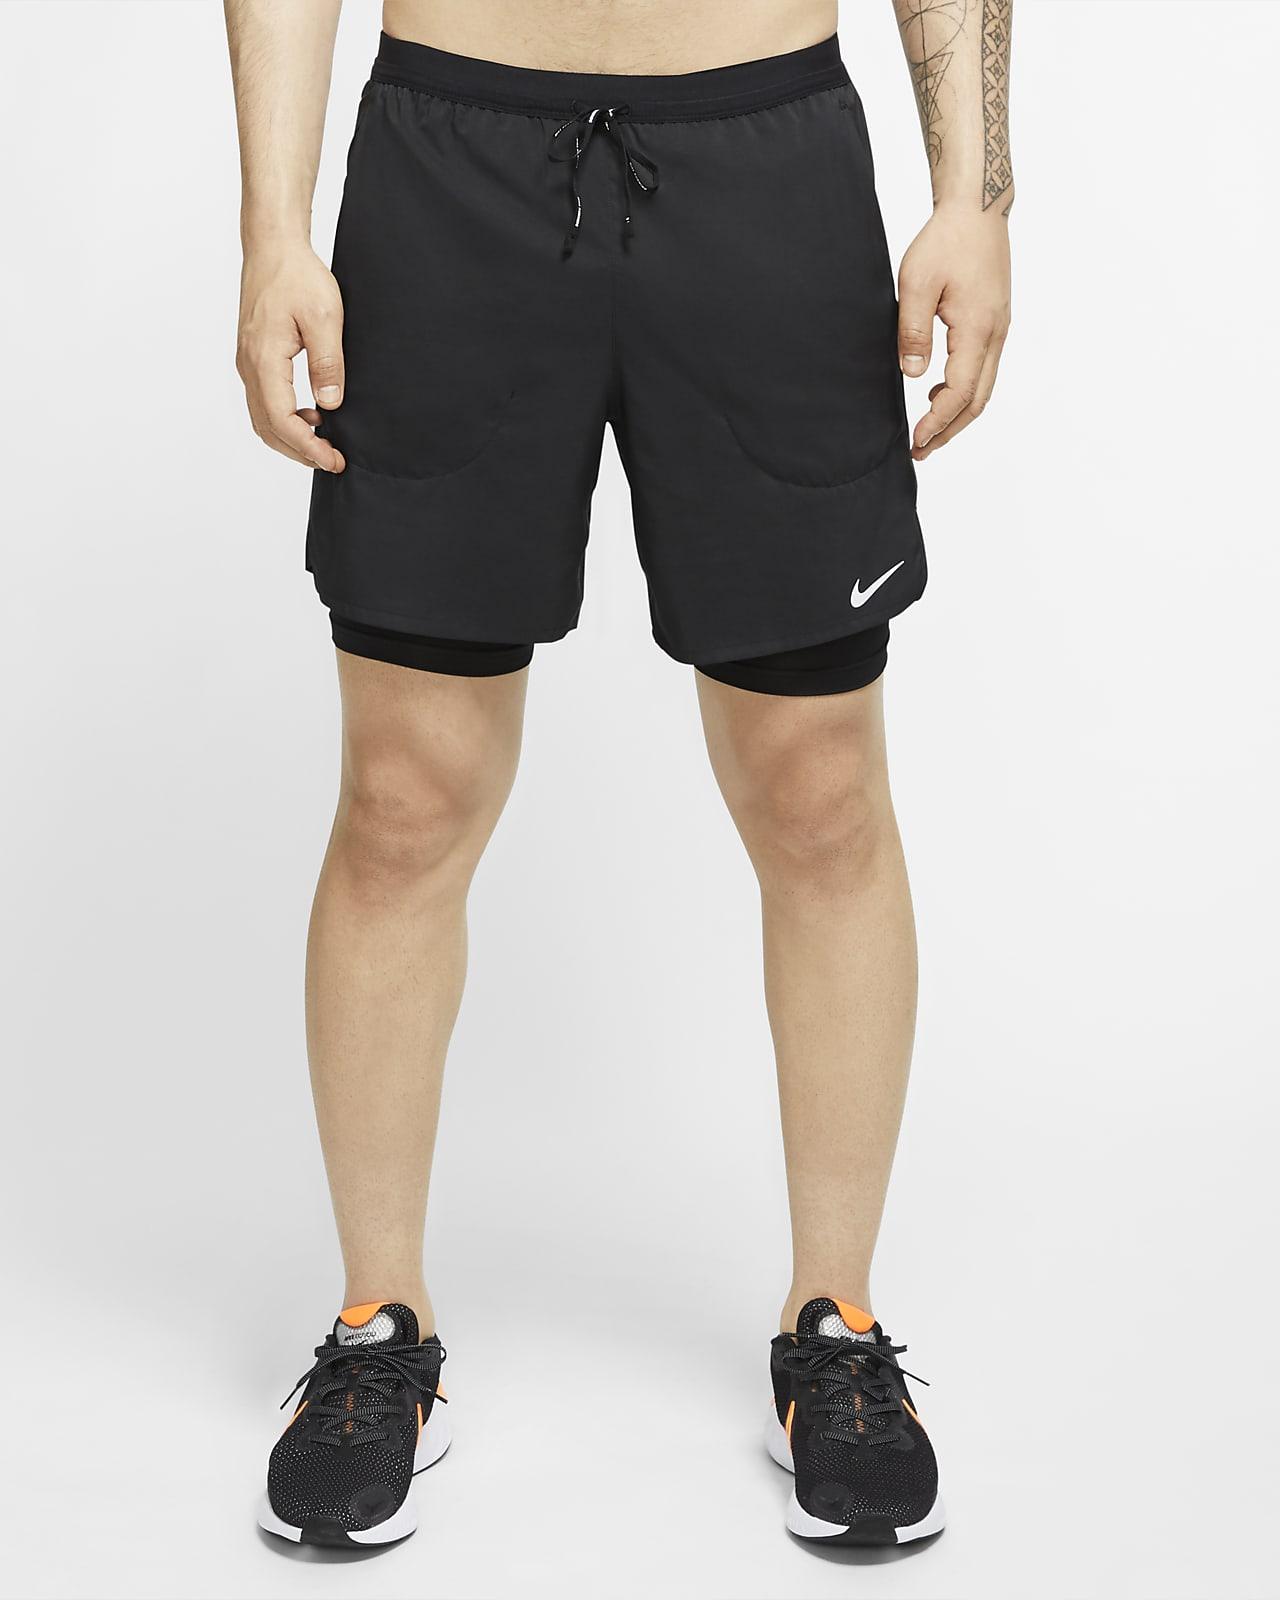 Nike Flex Stride Men's 18cm (approx.) 2-in-1 Running Shorts